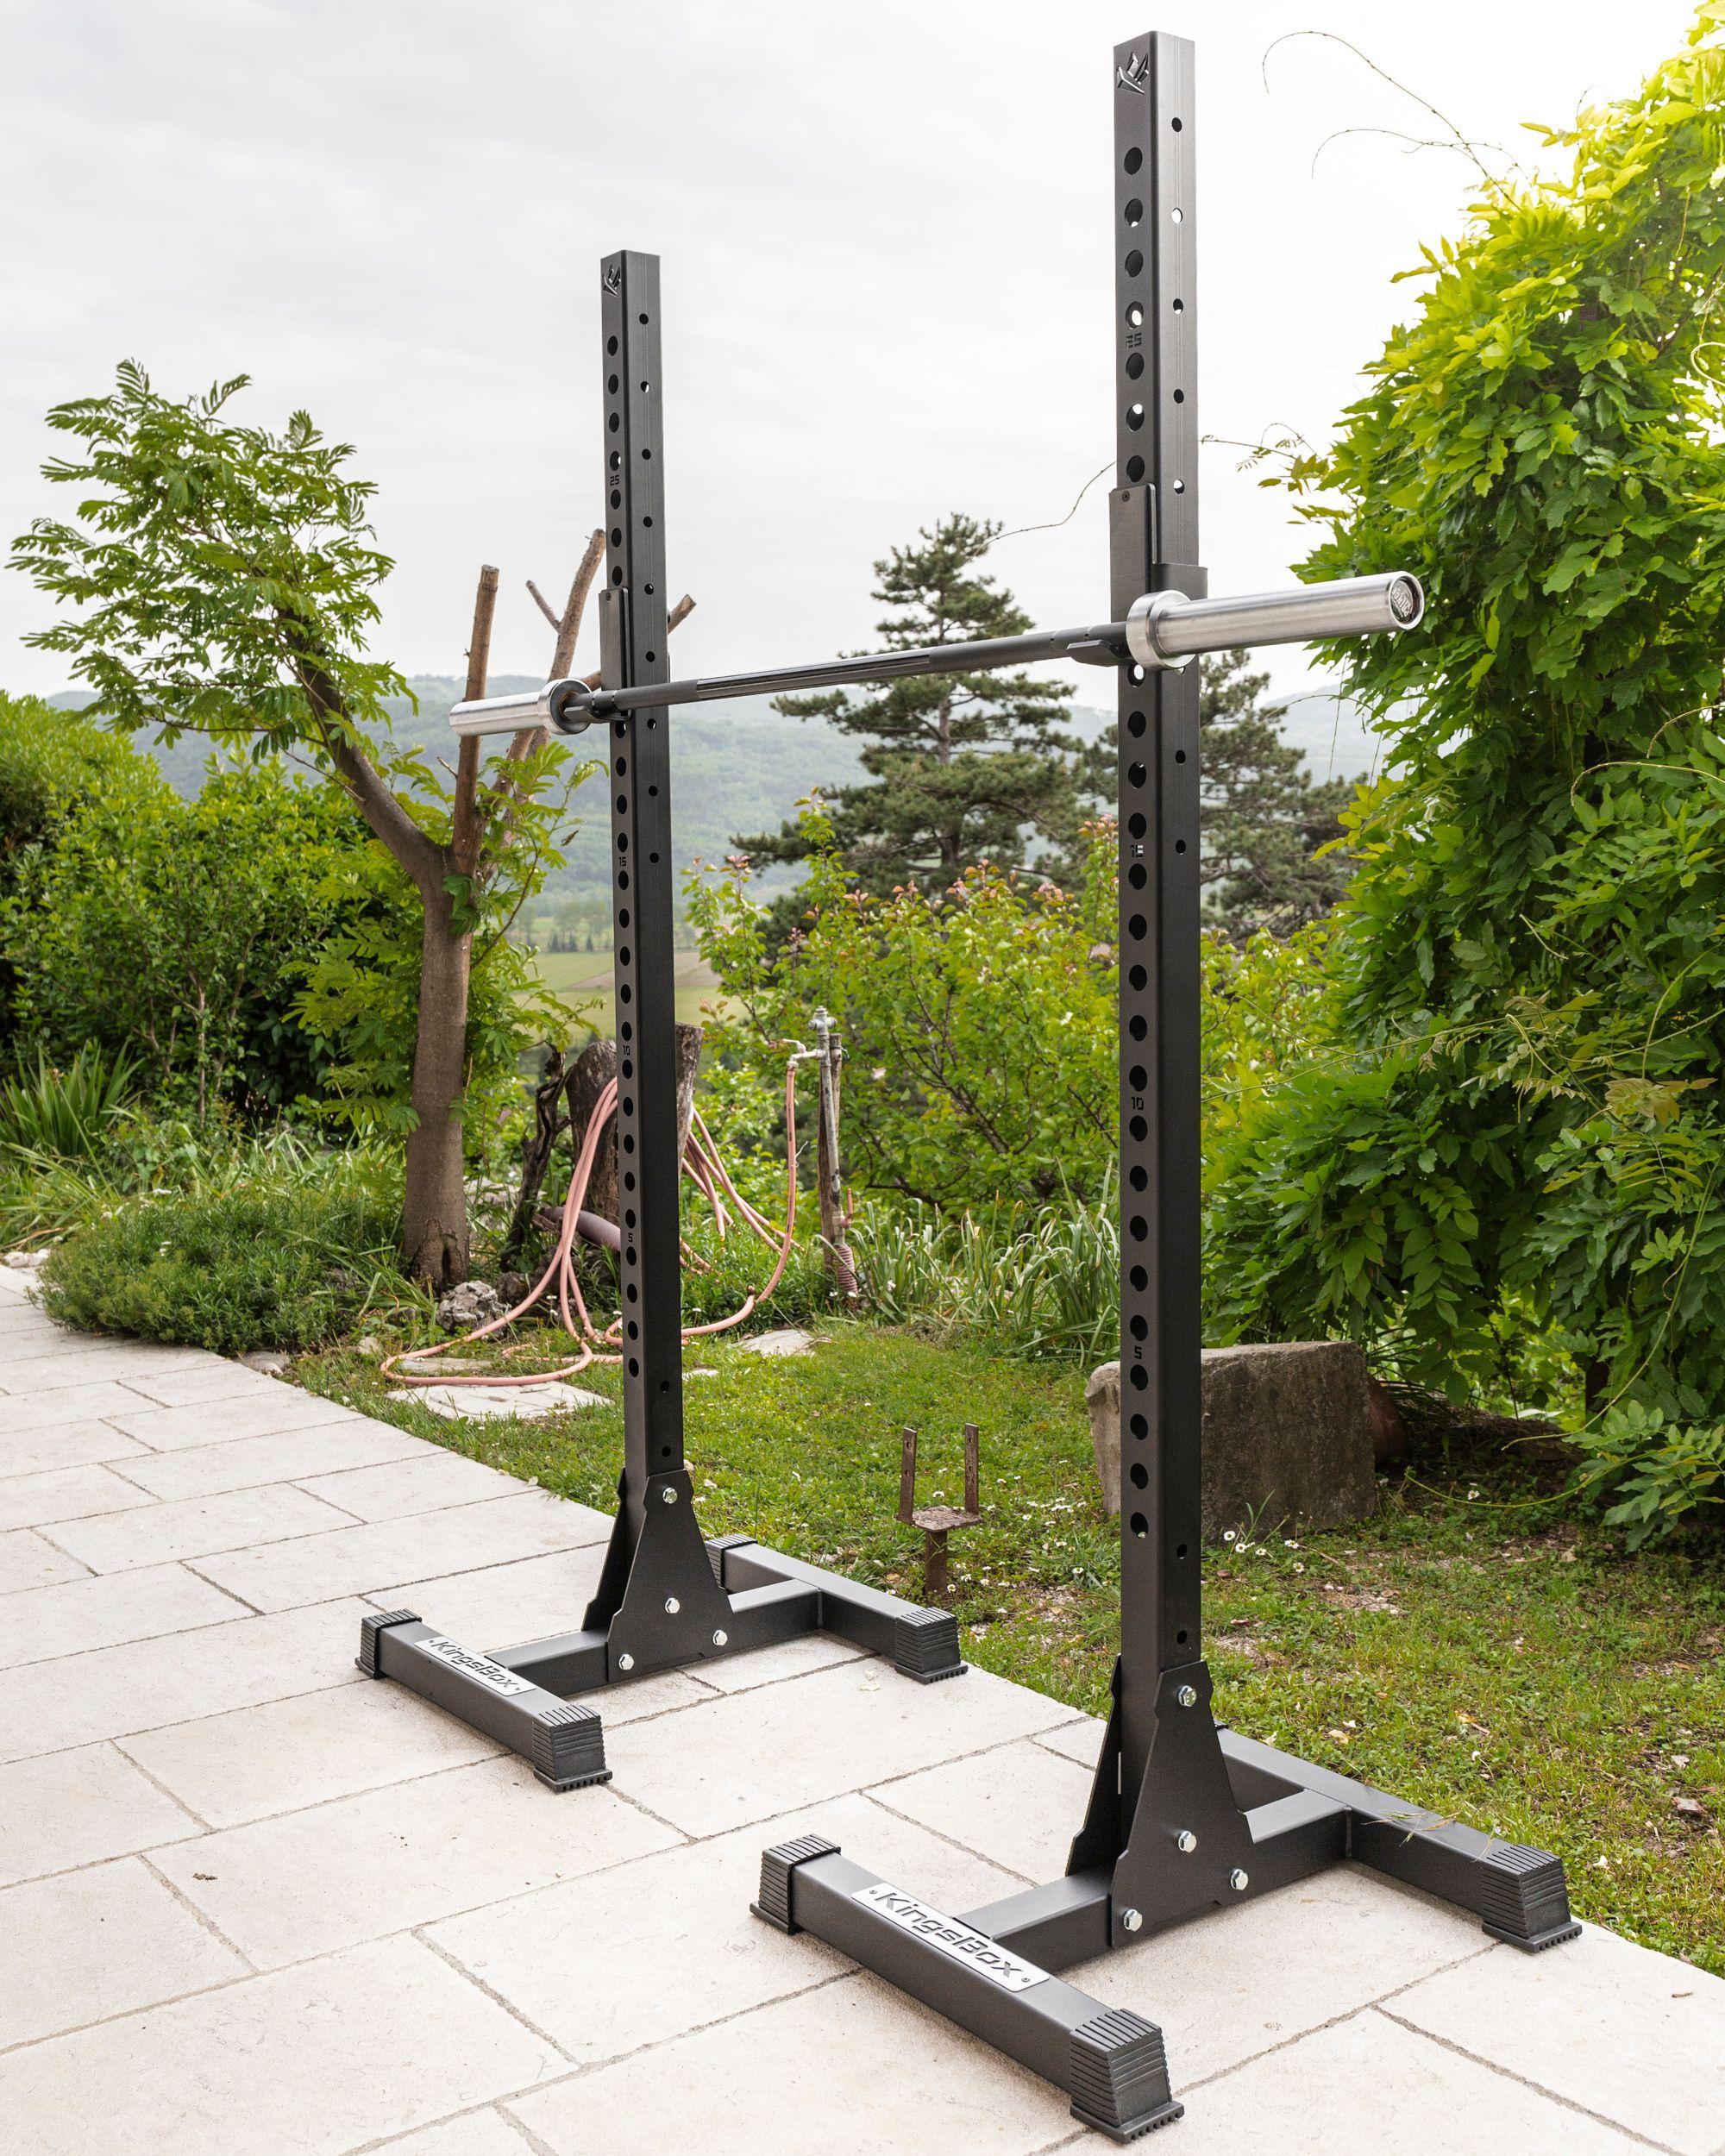 royal squat rack sx 5 ii kingsbox